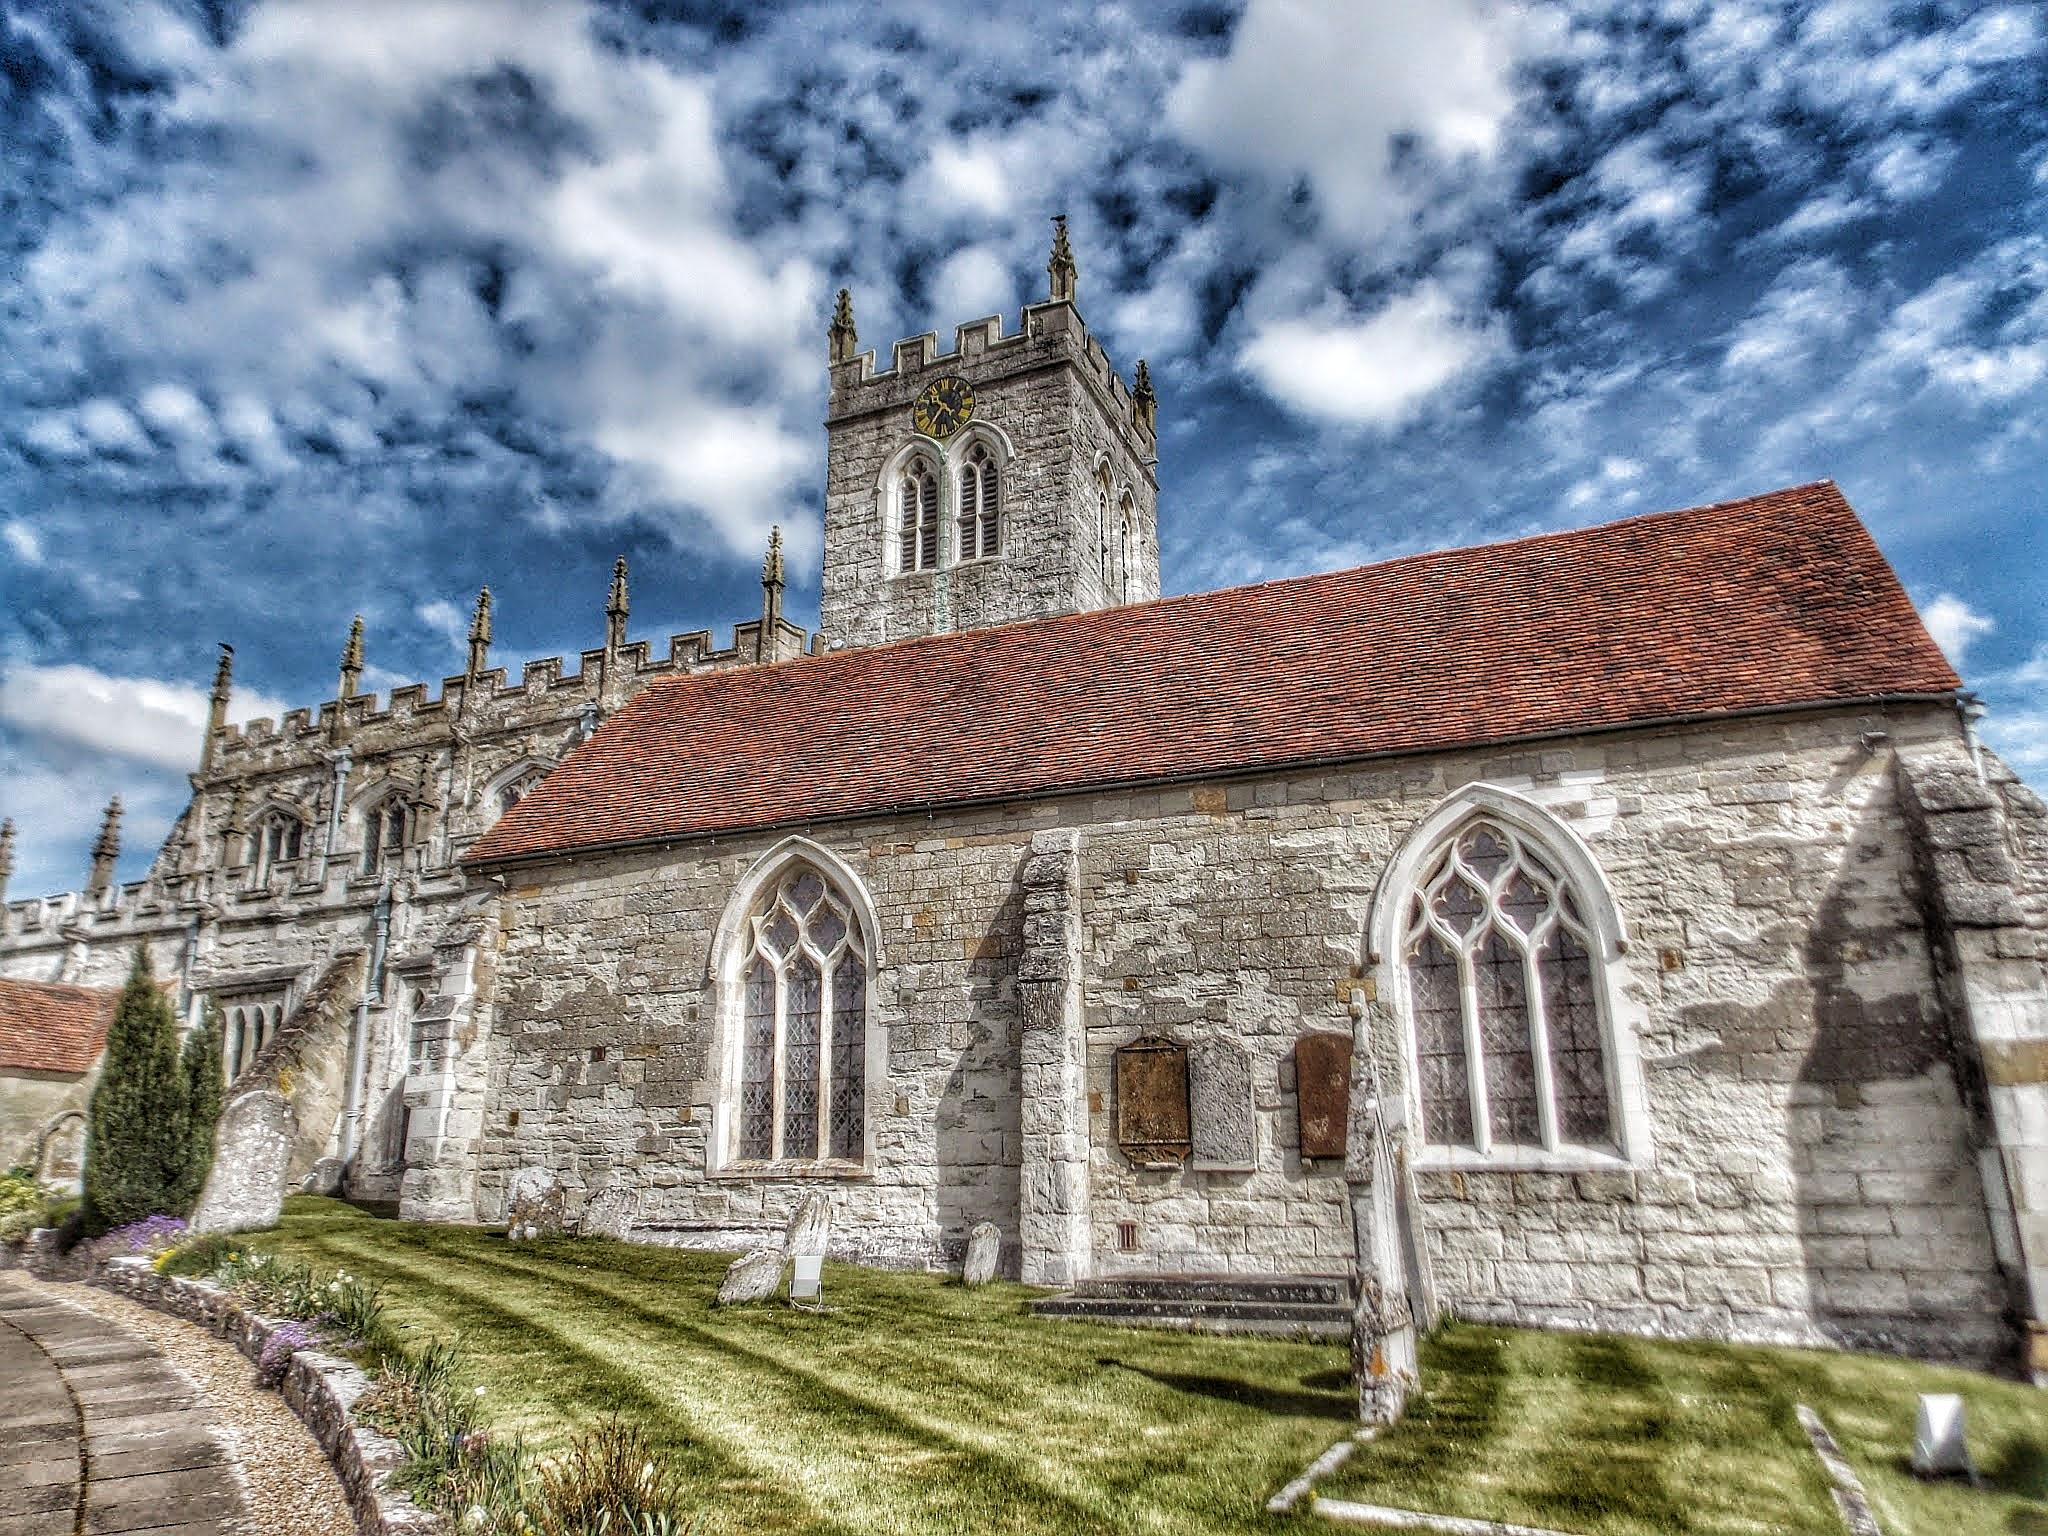 Wootton Wawen, St Peter's Church by David65